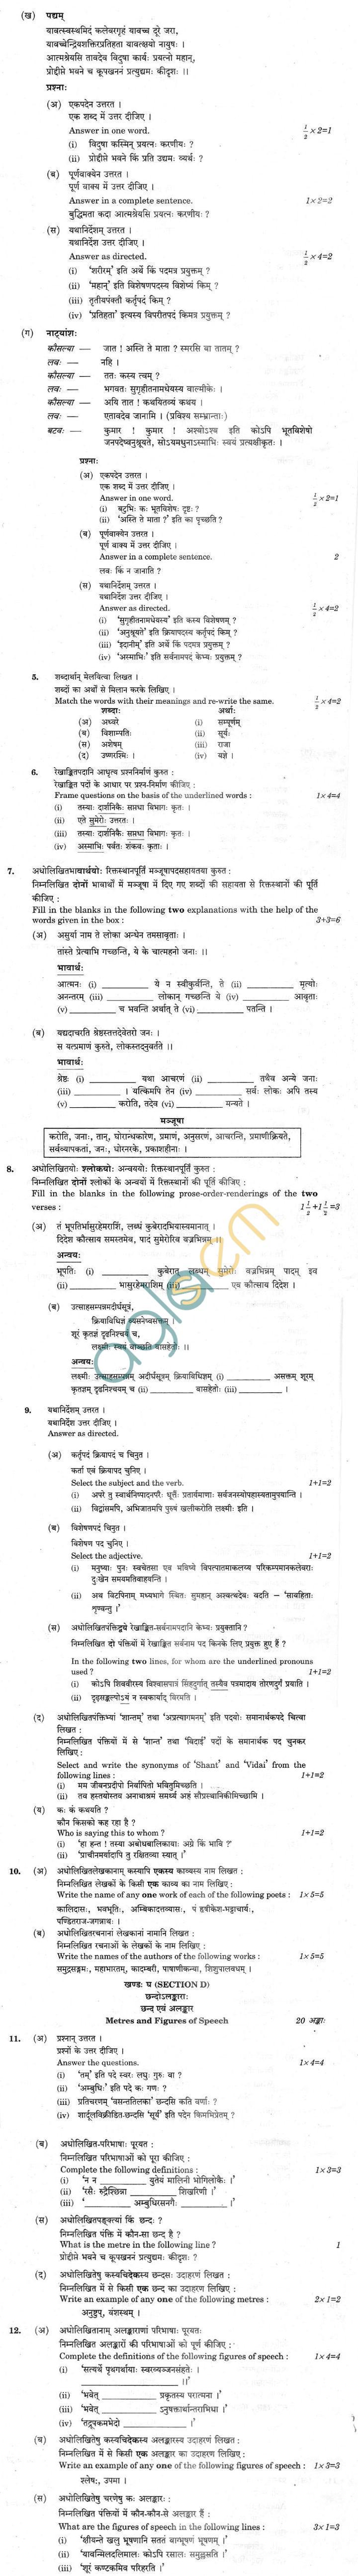 CBSE Compartment Exam 2013 Class XII Question Paper - Sanskrit (Elective)